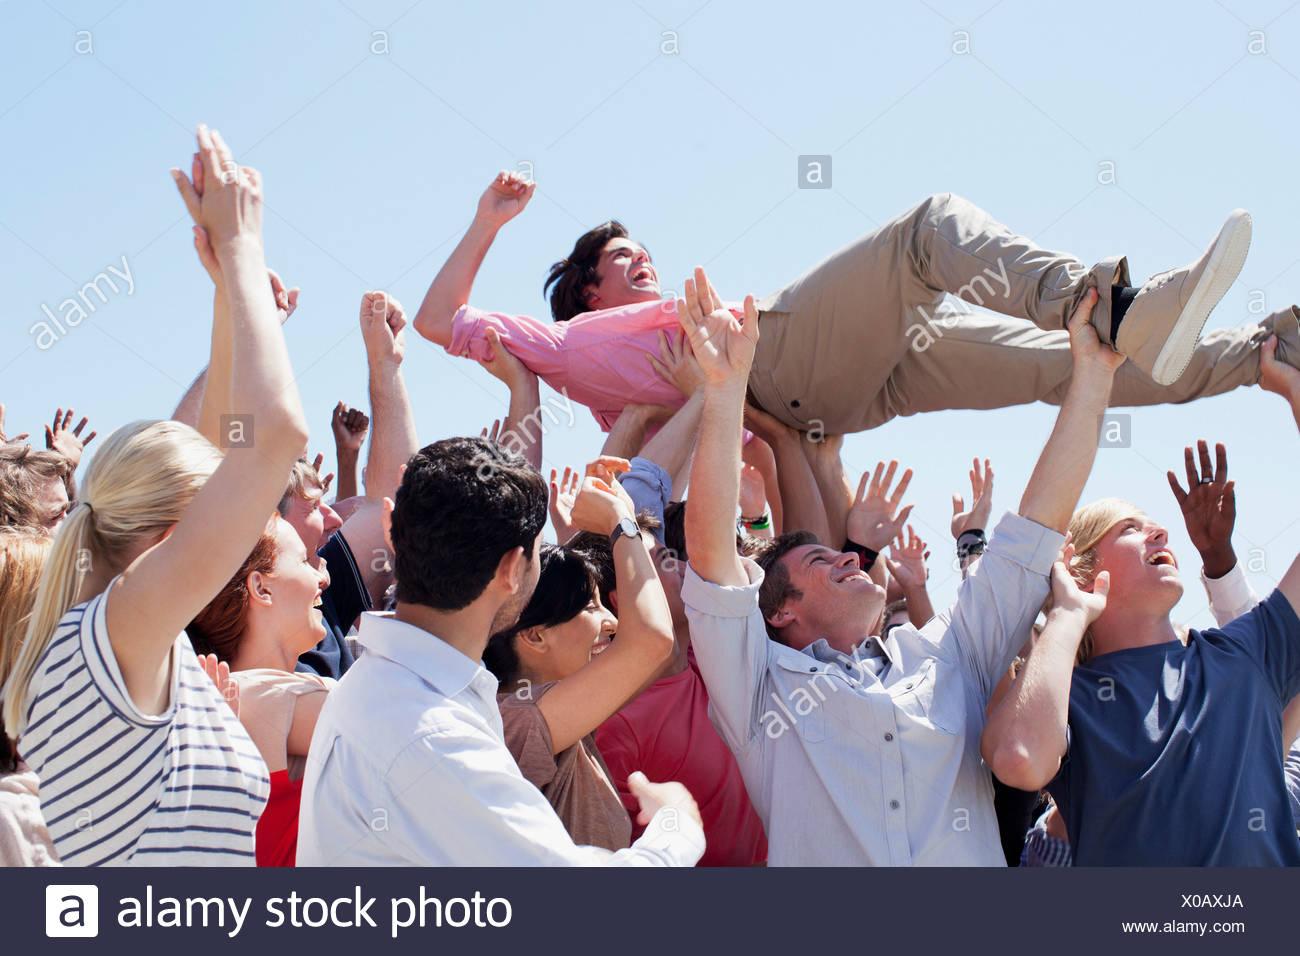 Hombre multitud surf Imagen De Stock